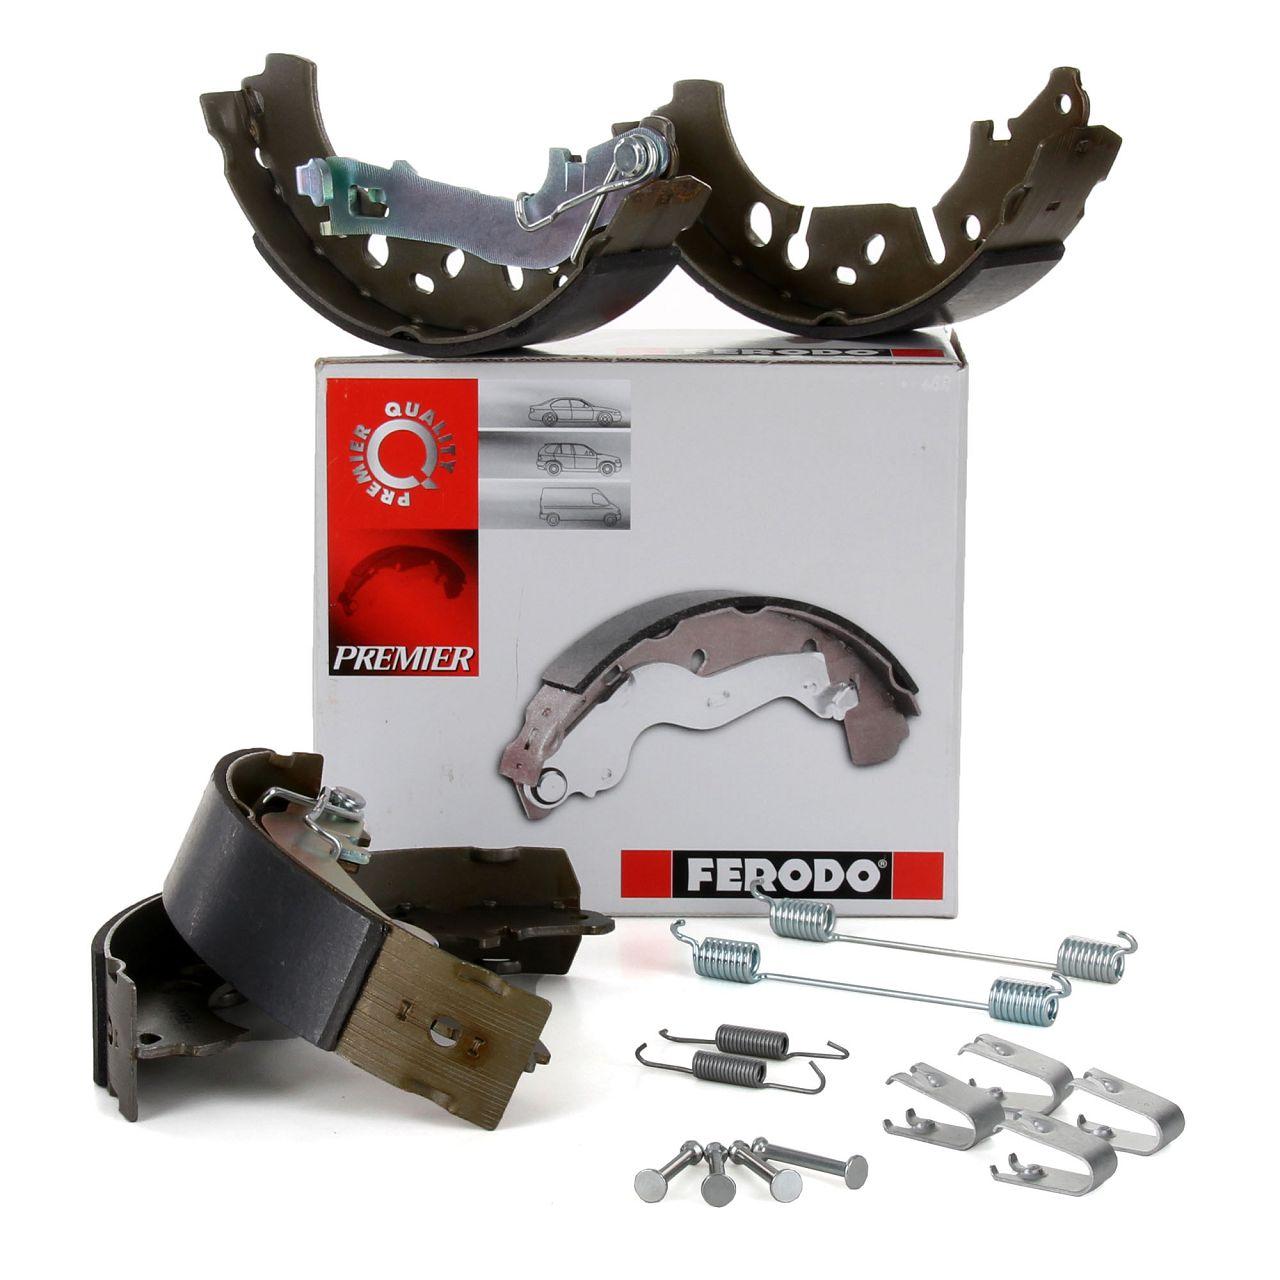 FERODO Bremsbacken + Federn Satz FIAT Grande / Punto Evo 199 OPEL Adam Crosa D E